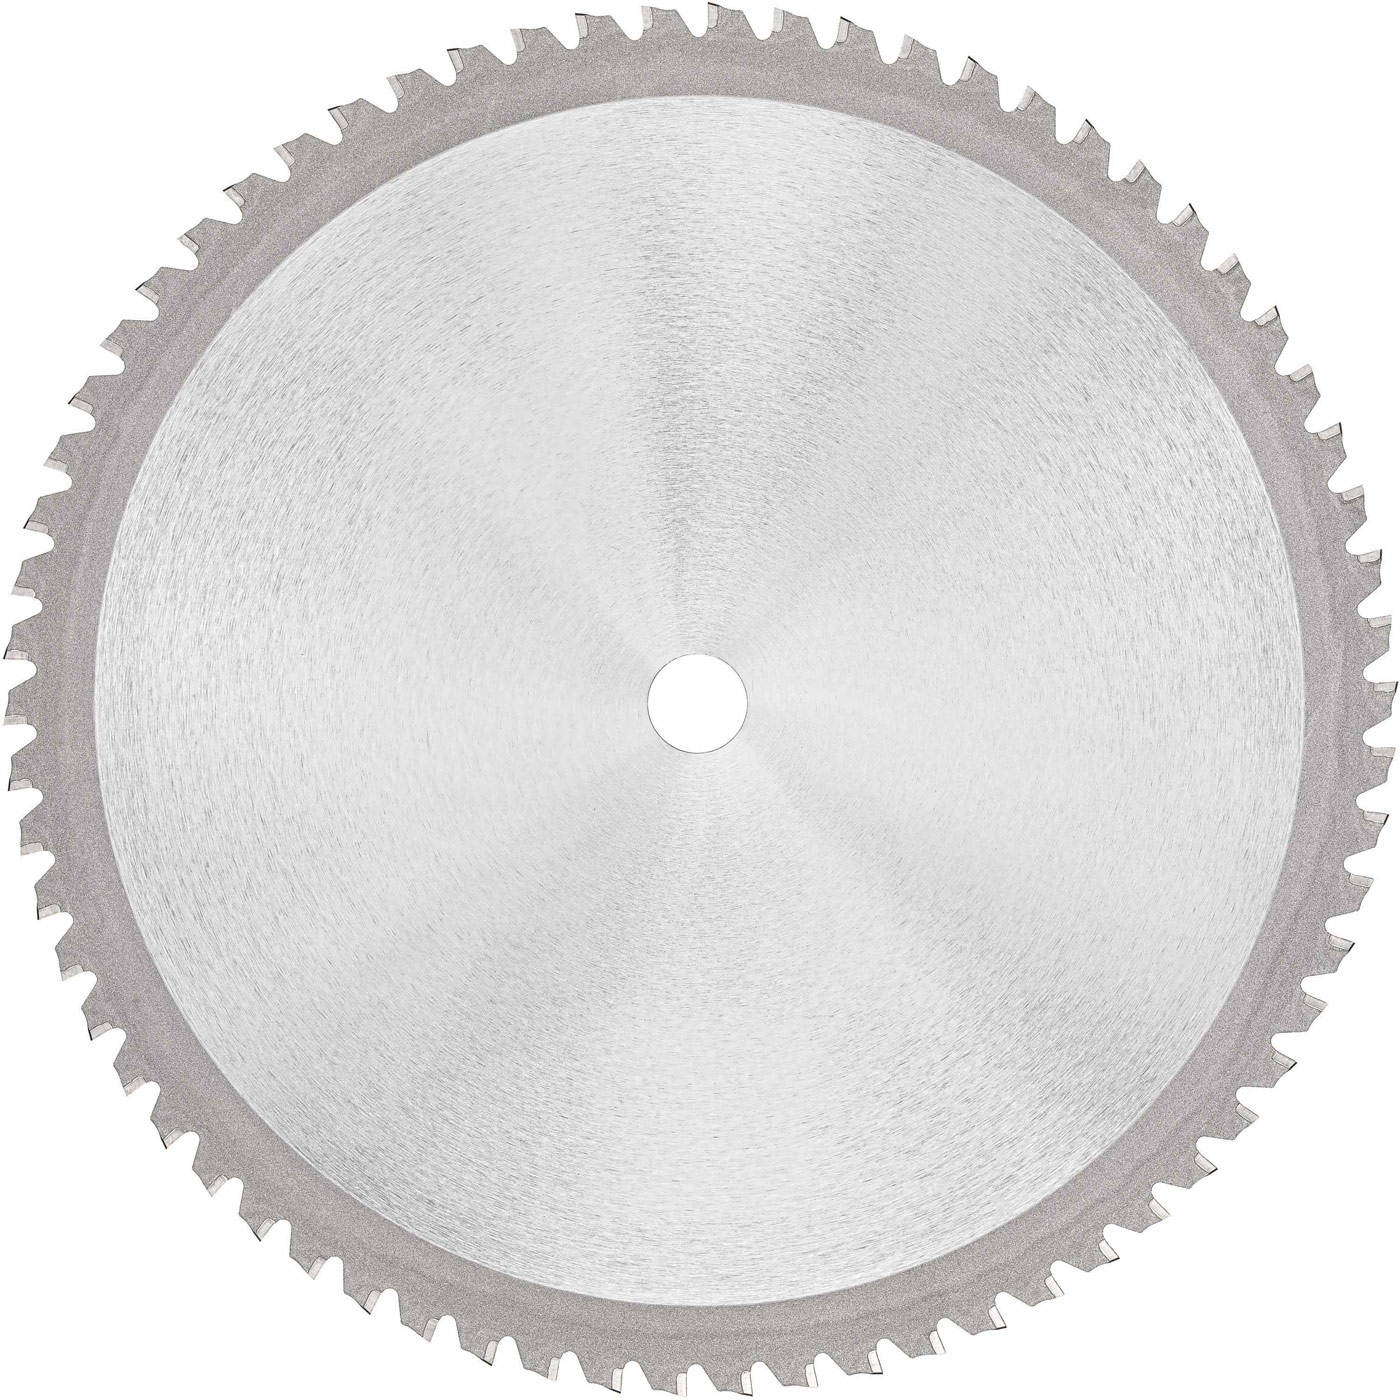 Tool accessories circular saw blades dewalt dwa7747 14 66t multi blade ferrous saw blade greentooth Choice Image